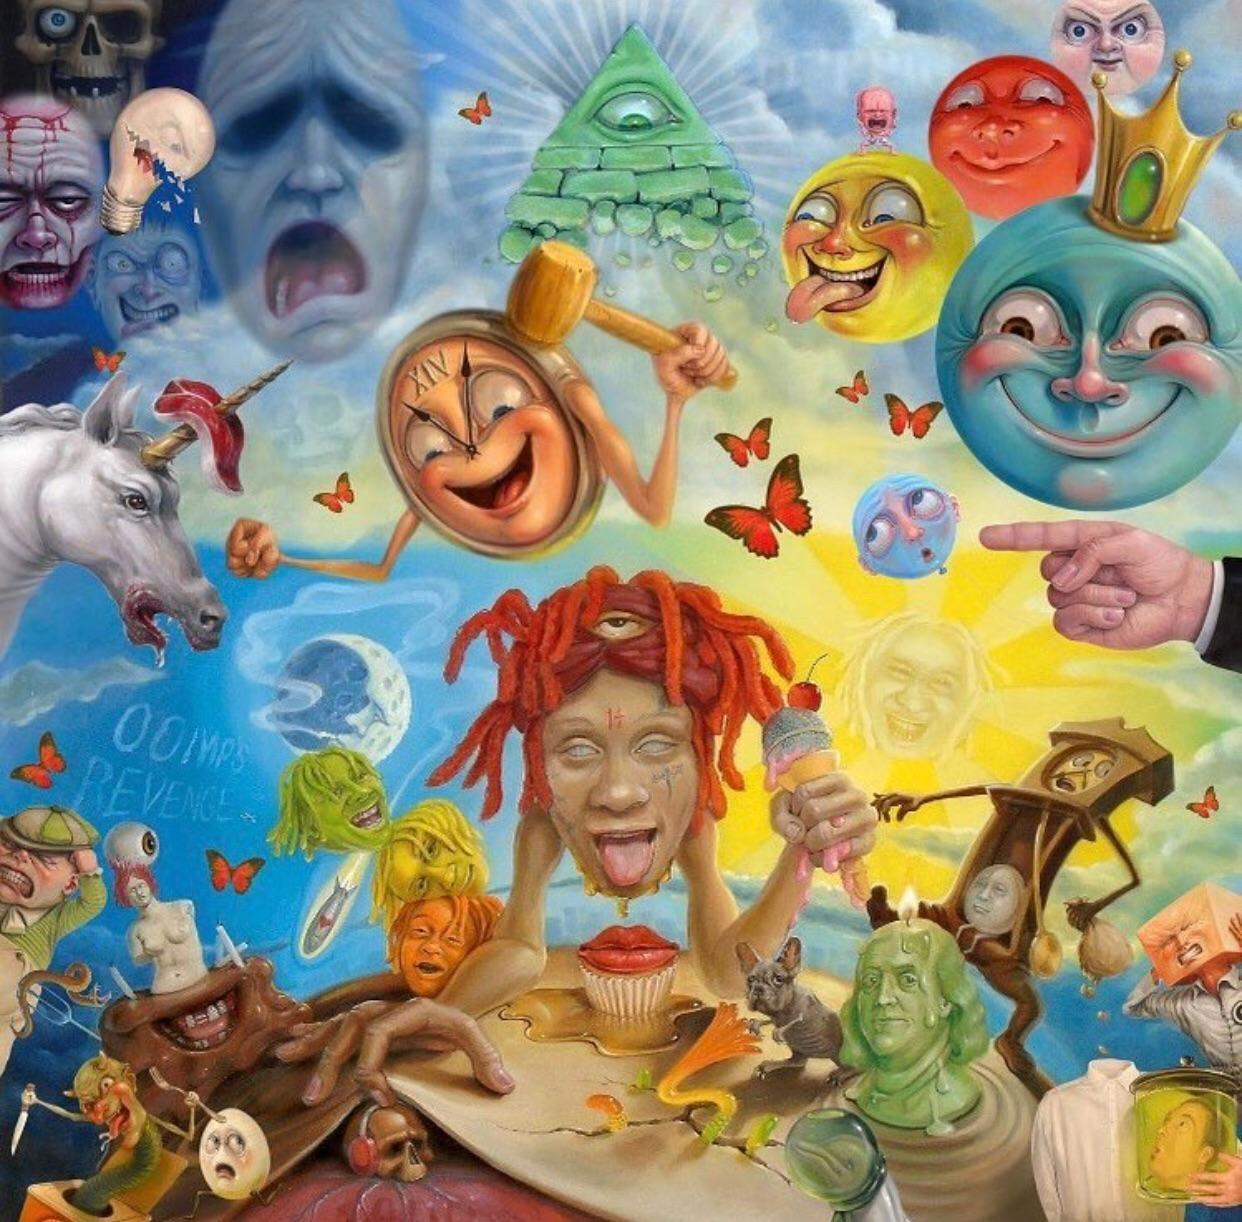 Trippie Redd Lifes A Trip Album Art Cover Art Art Music Vinyl Album Cover Art Rap Album Covers Album Art